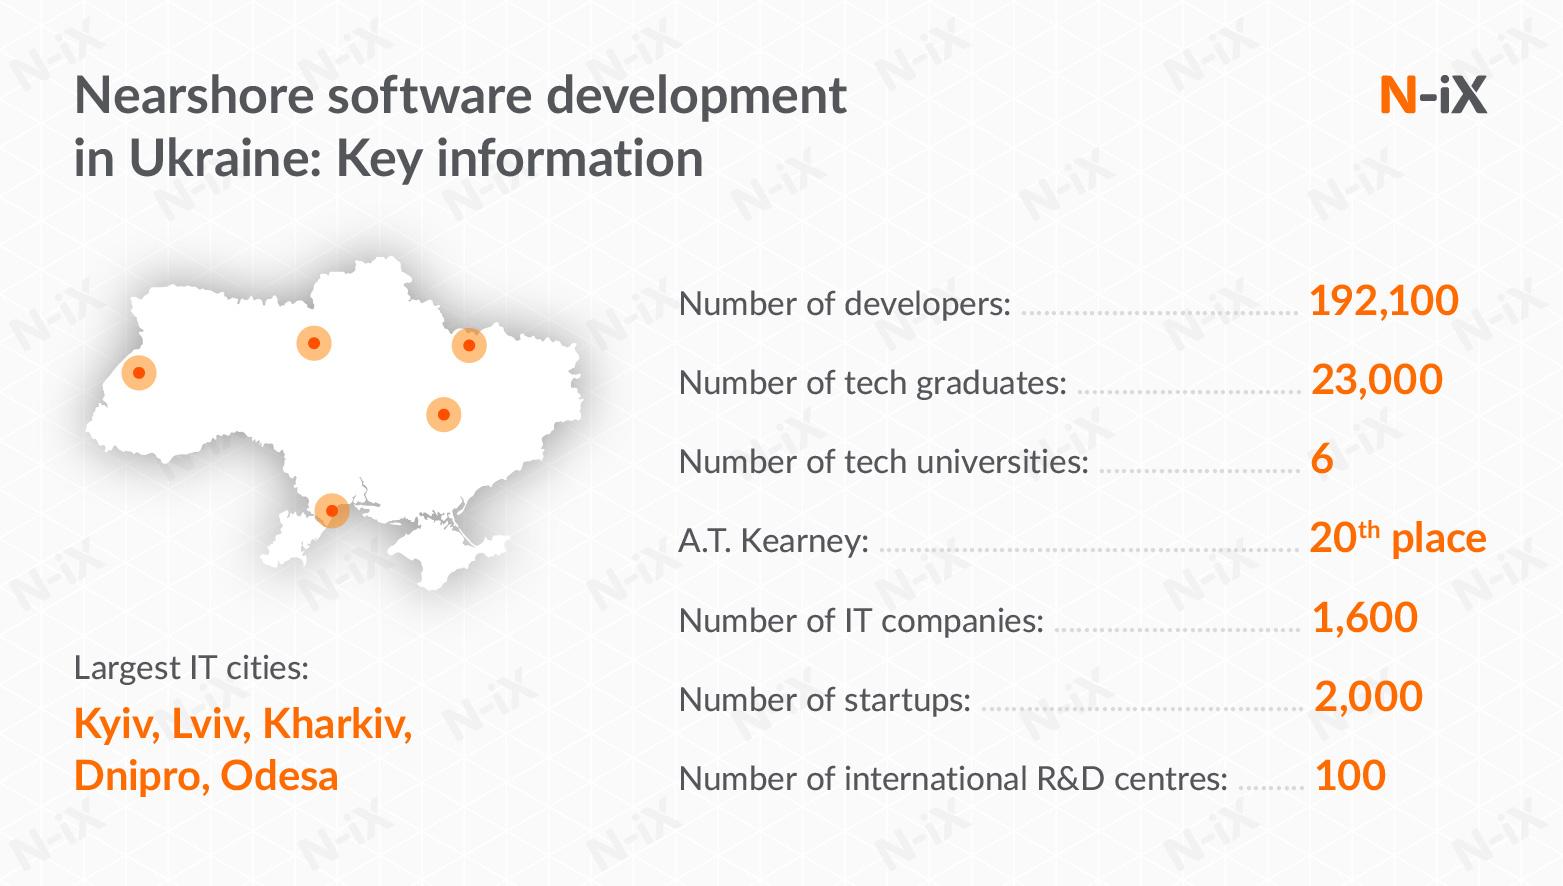 nearshore software development in Ukraine: key information